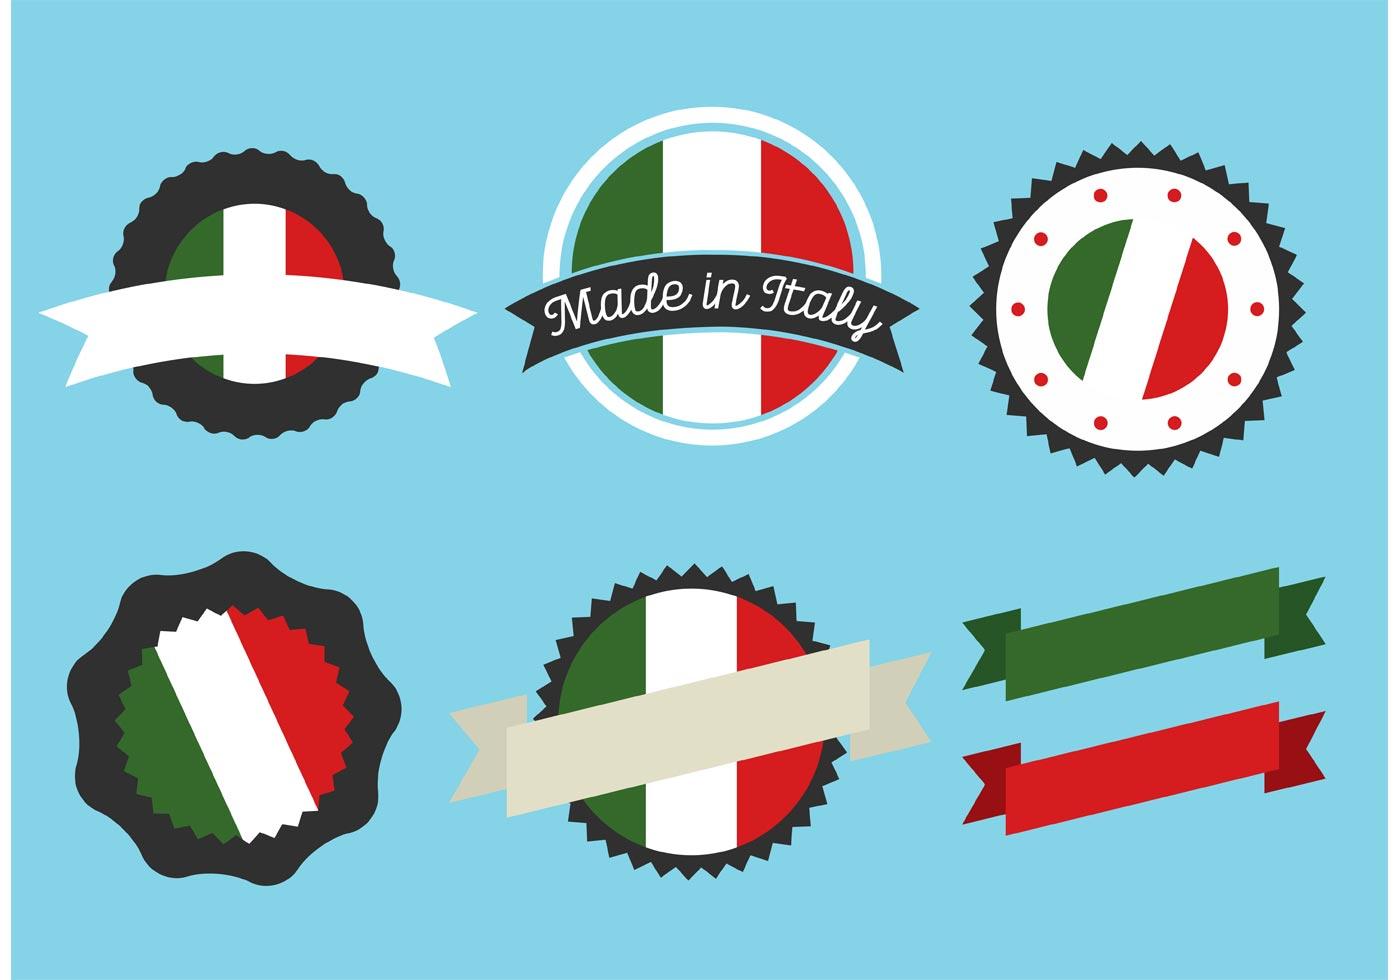 Italian Restaurant Logo With Flag: Download Free Vectors, Clipart